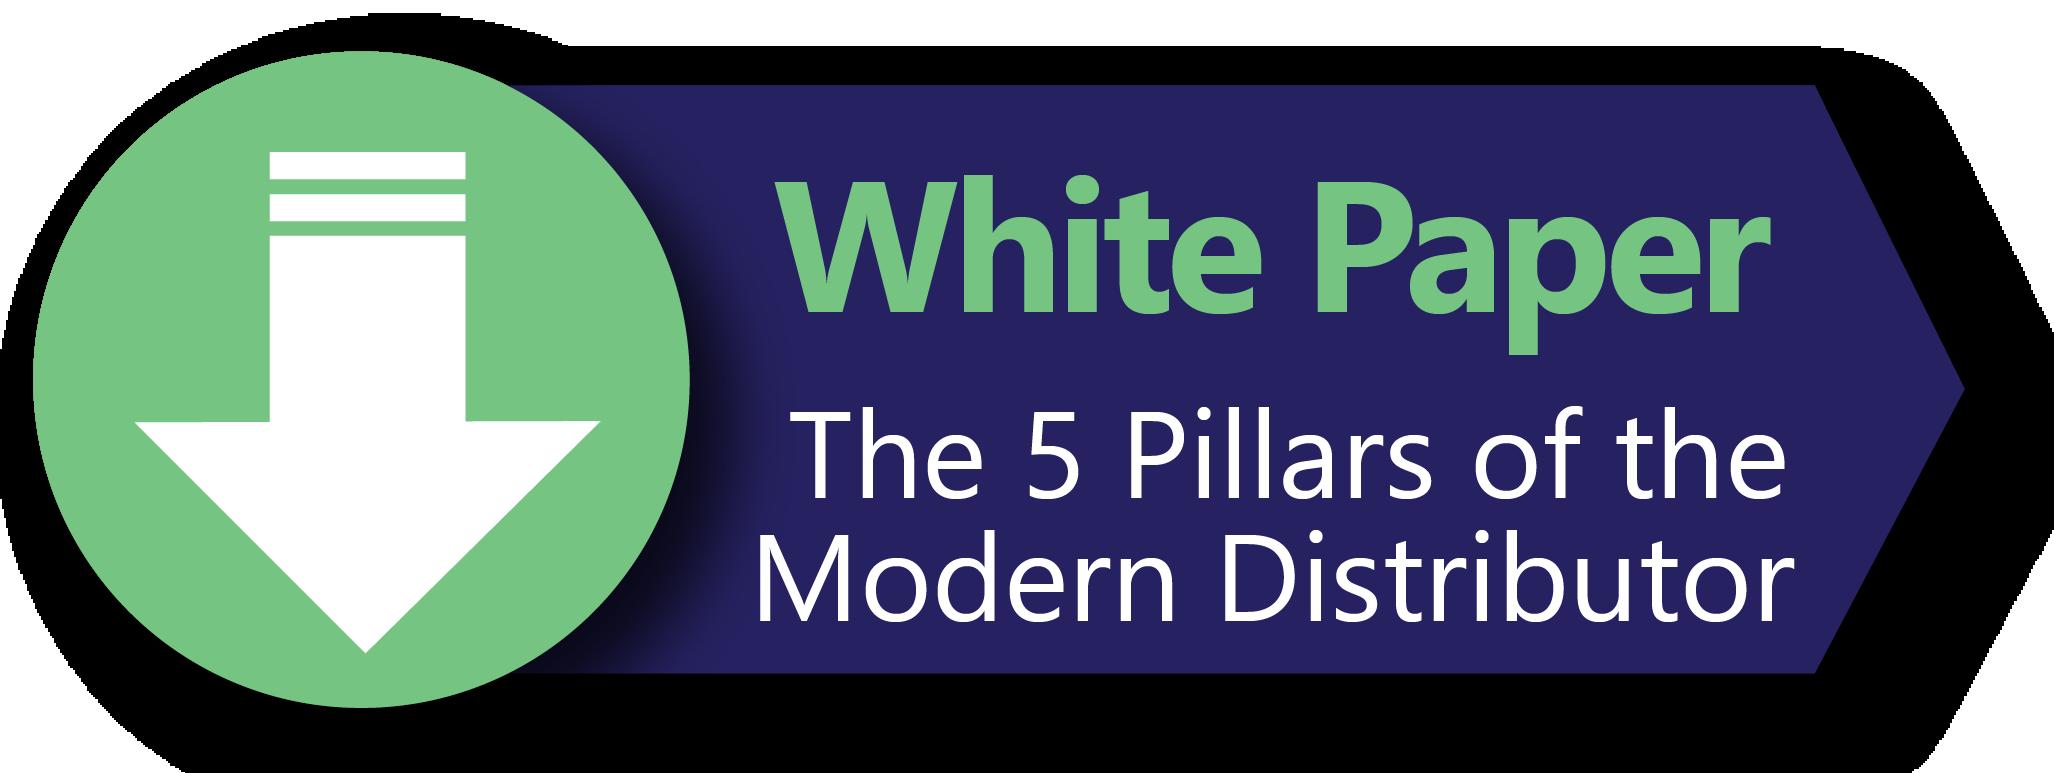 5 Pillars of the Modern Distributor Whitepaper